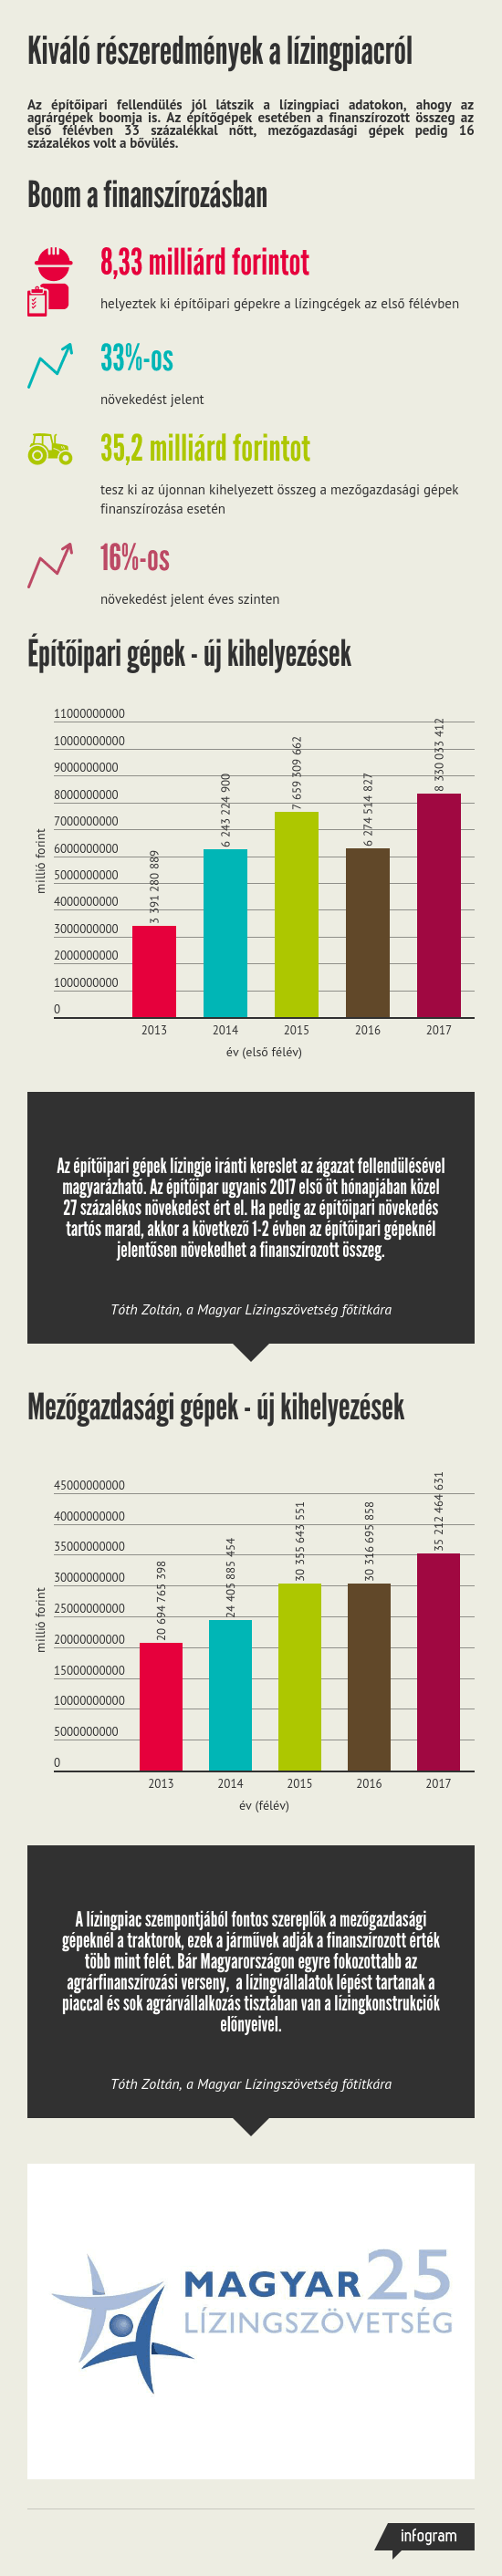 copy_lizing_q2_reszletes_1.png